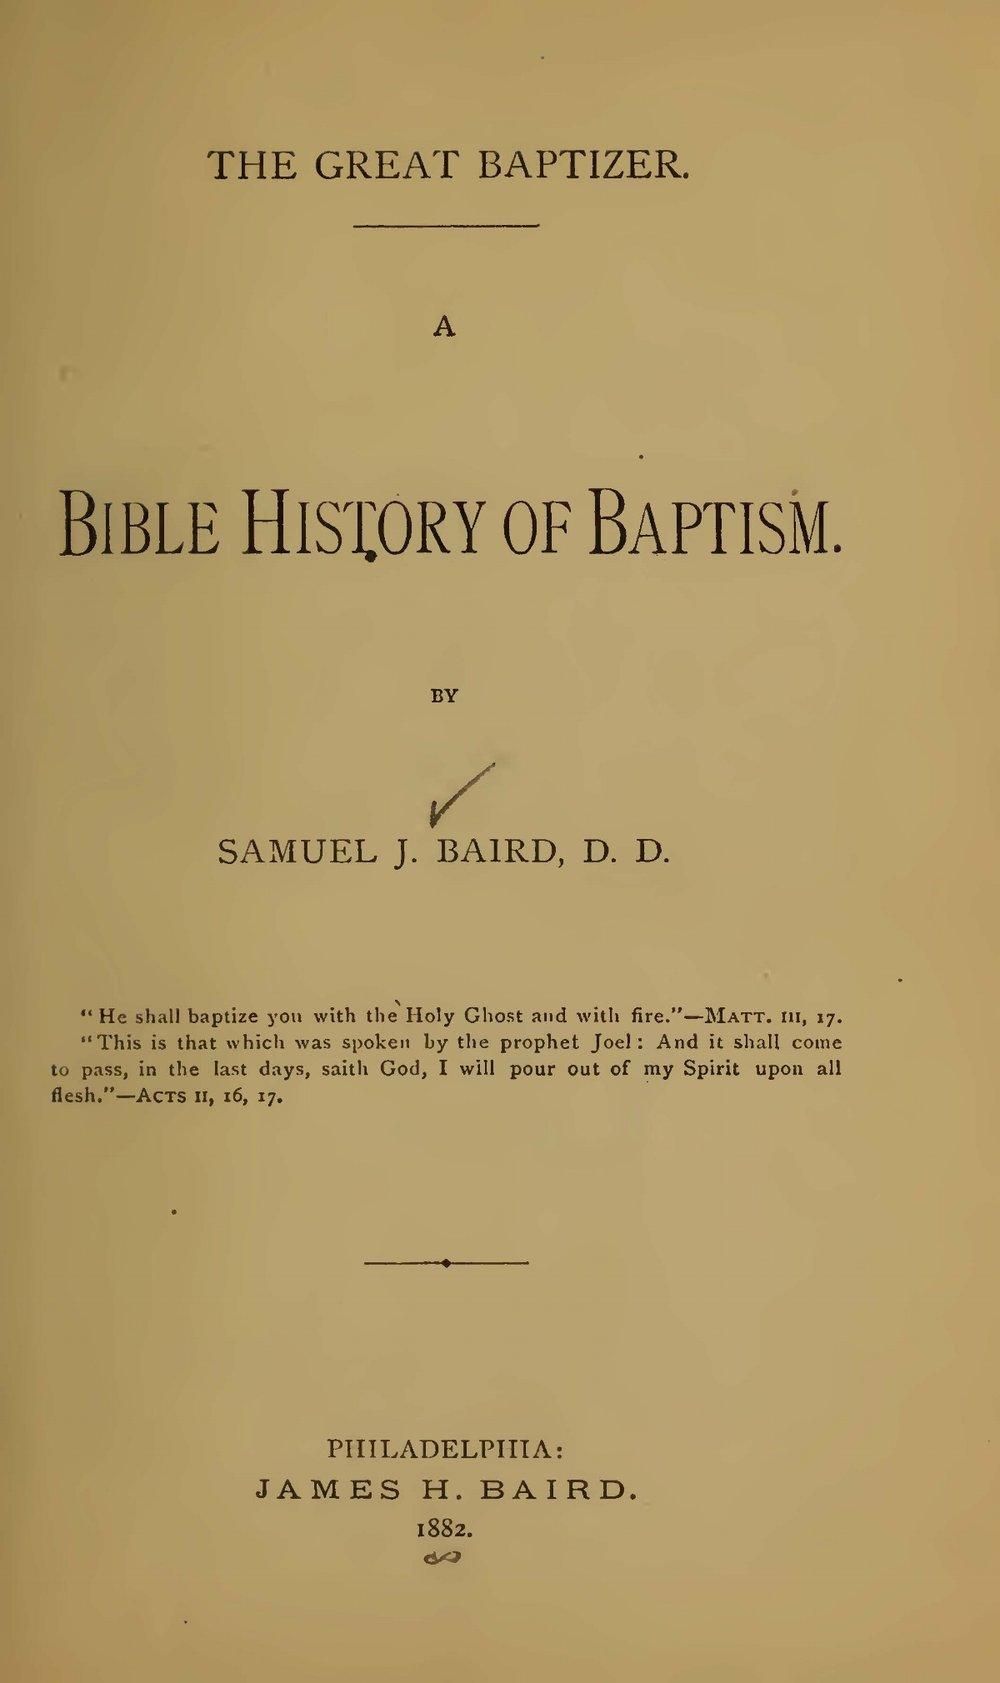 Baird, Samuel John, A Bible History of Baptism Title Page.jpg